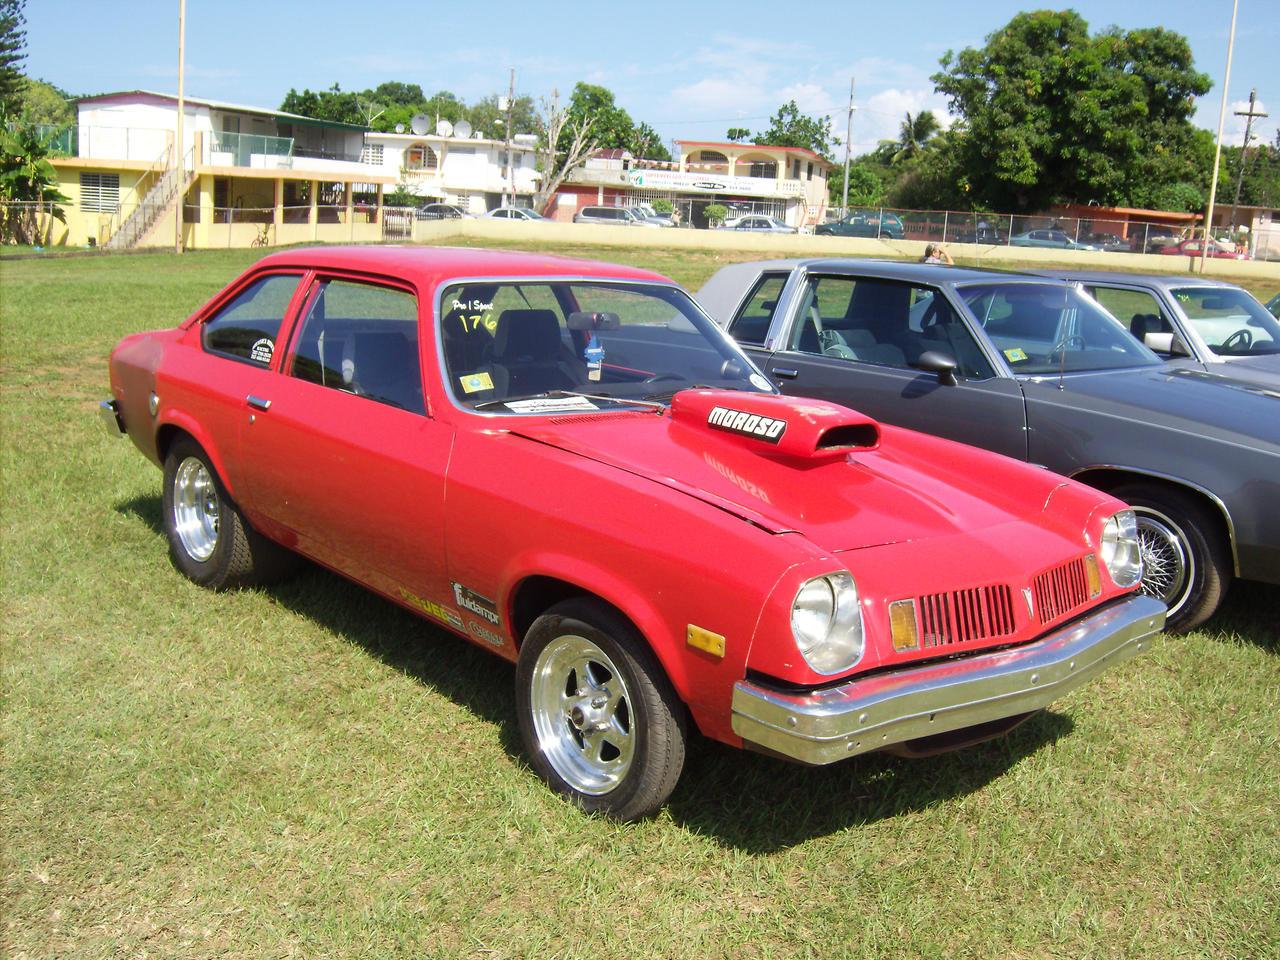 1977 Pontiac Astre by LPAGAN401 on deviantART